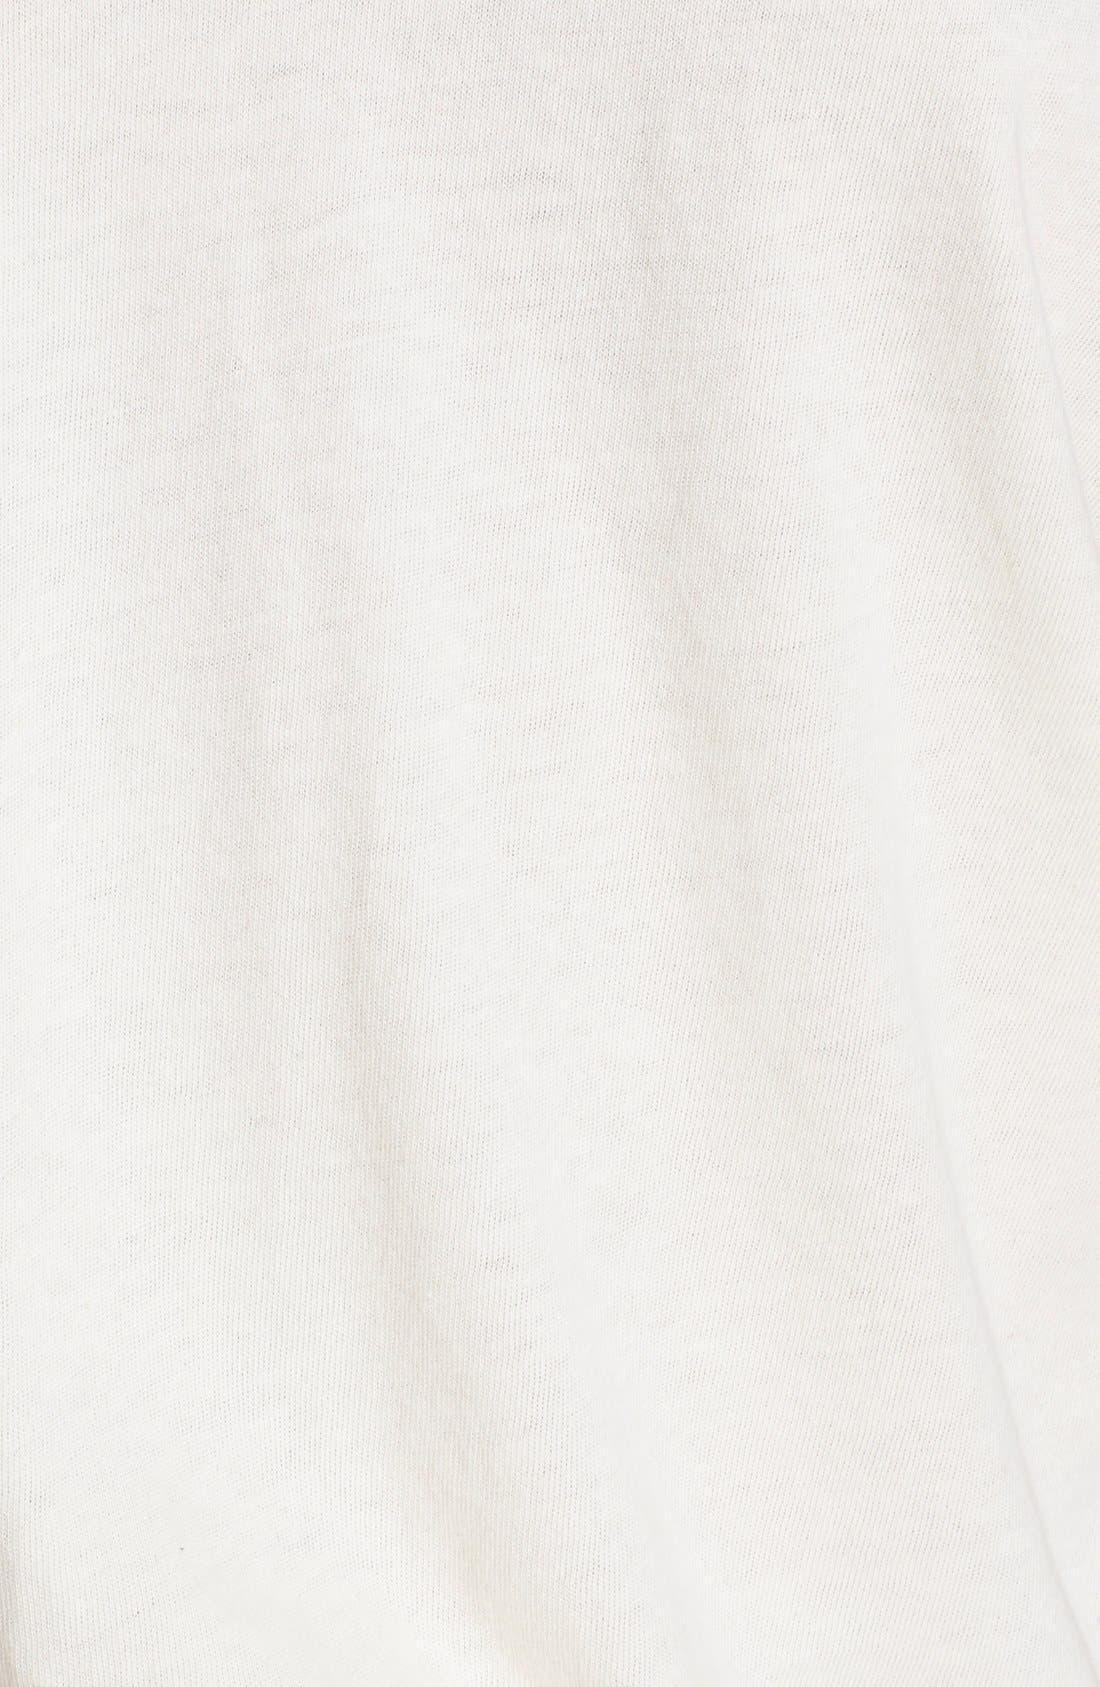 U-Neck Cotton Tee,                             Alternate thumbnail 2, color,                             WASHED WHITE